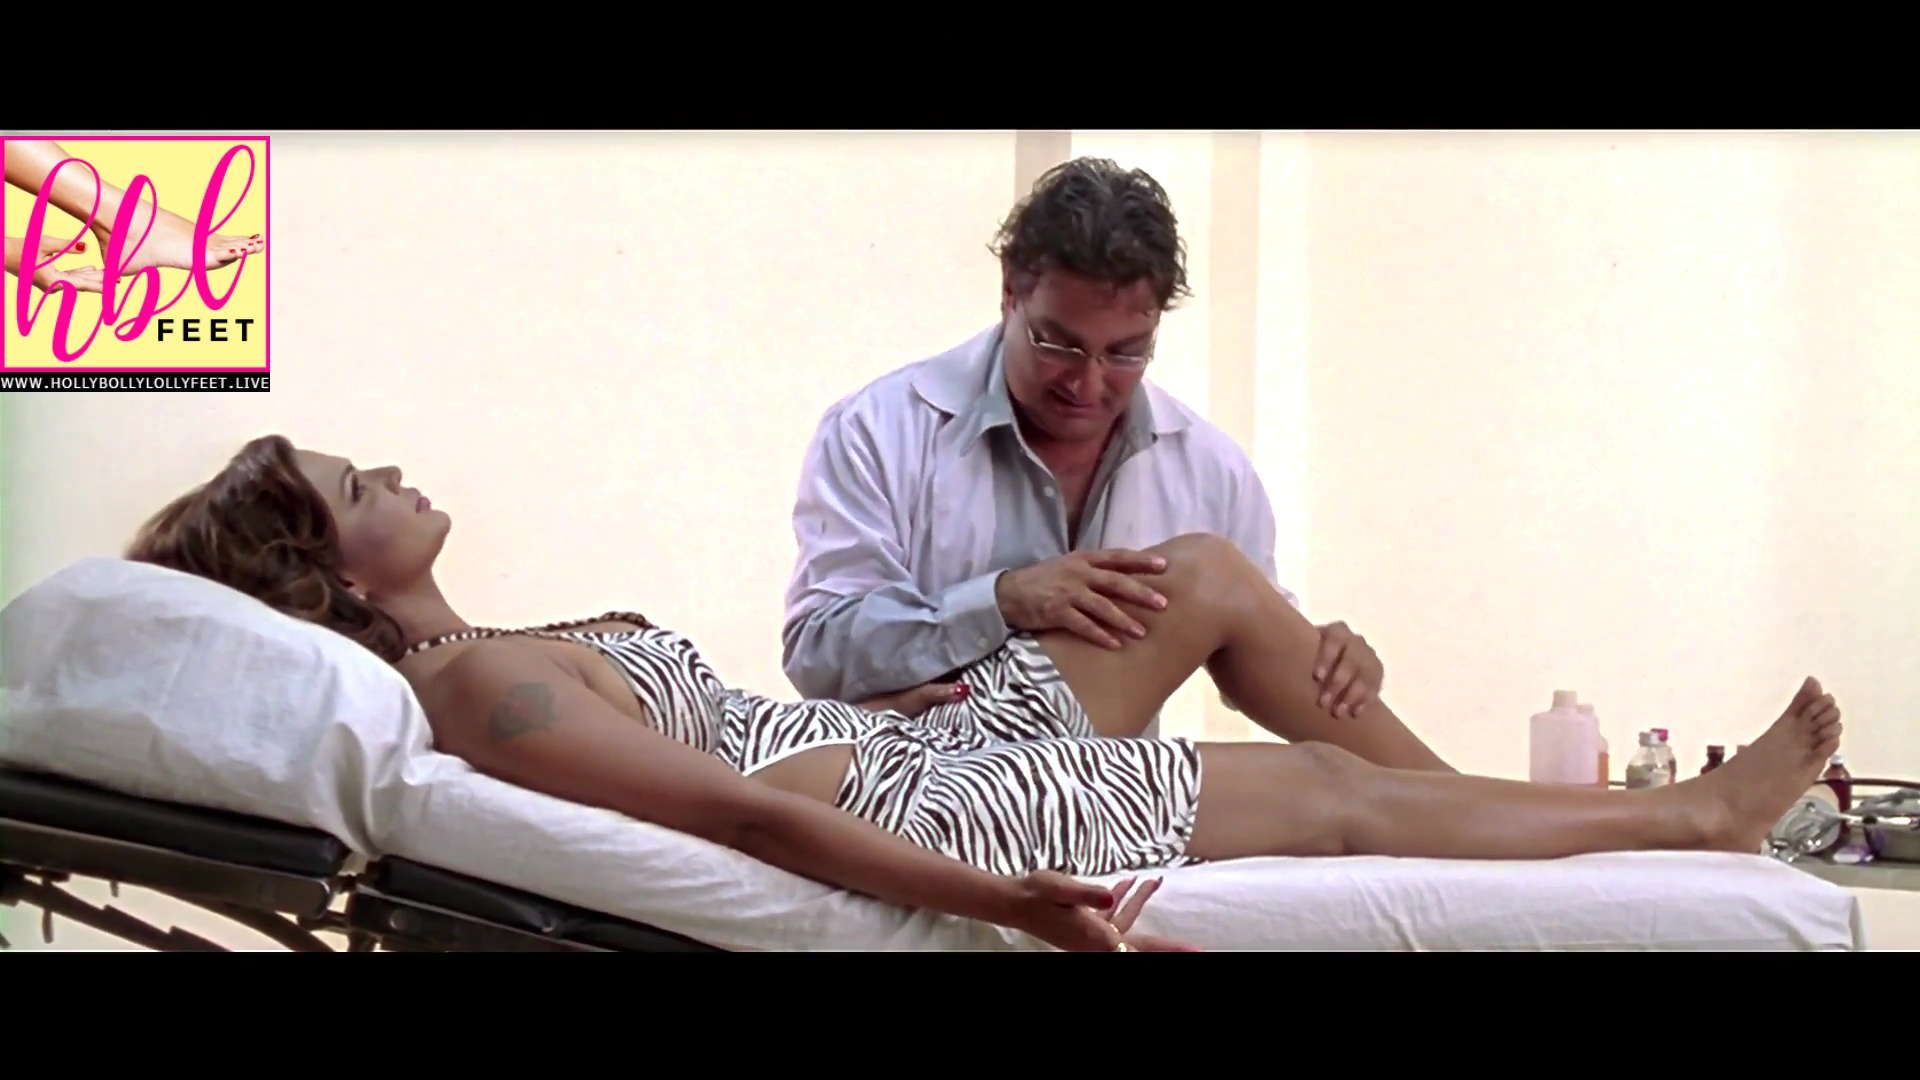 Buddha Mar Gaya Movie 720p Free Downloadl rakhi-sawant-feet-buddha-mar-gaya-02